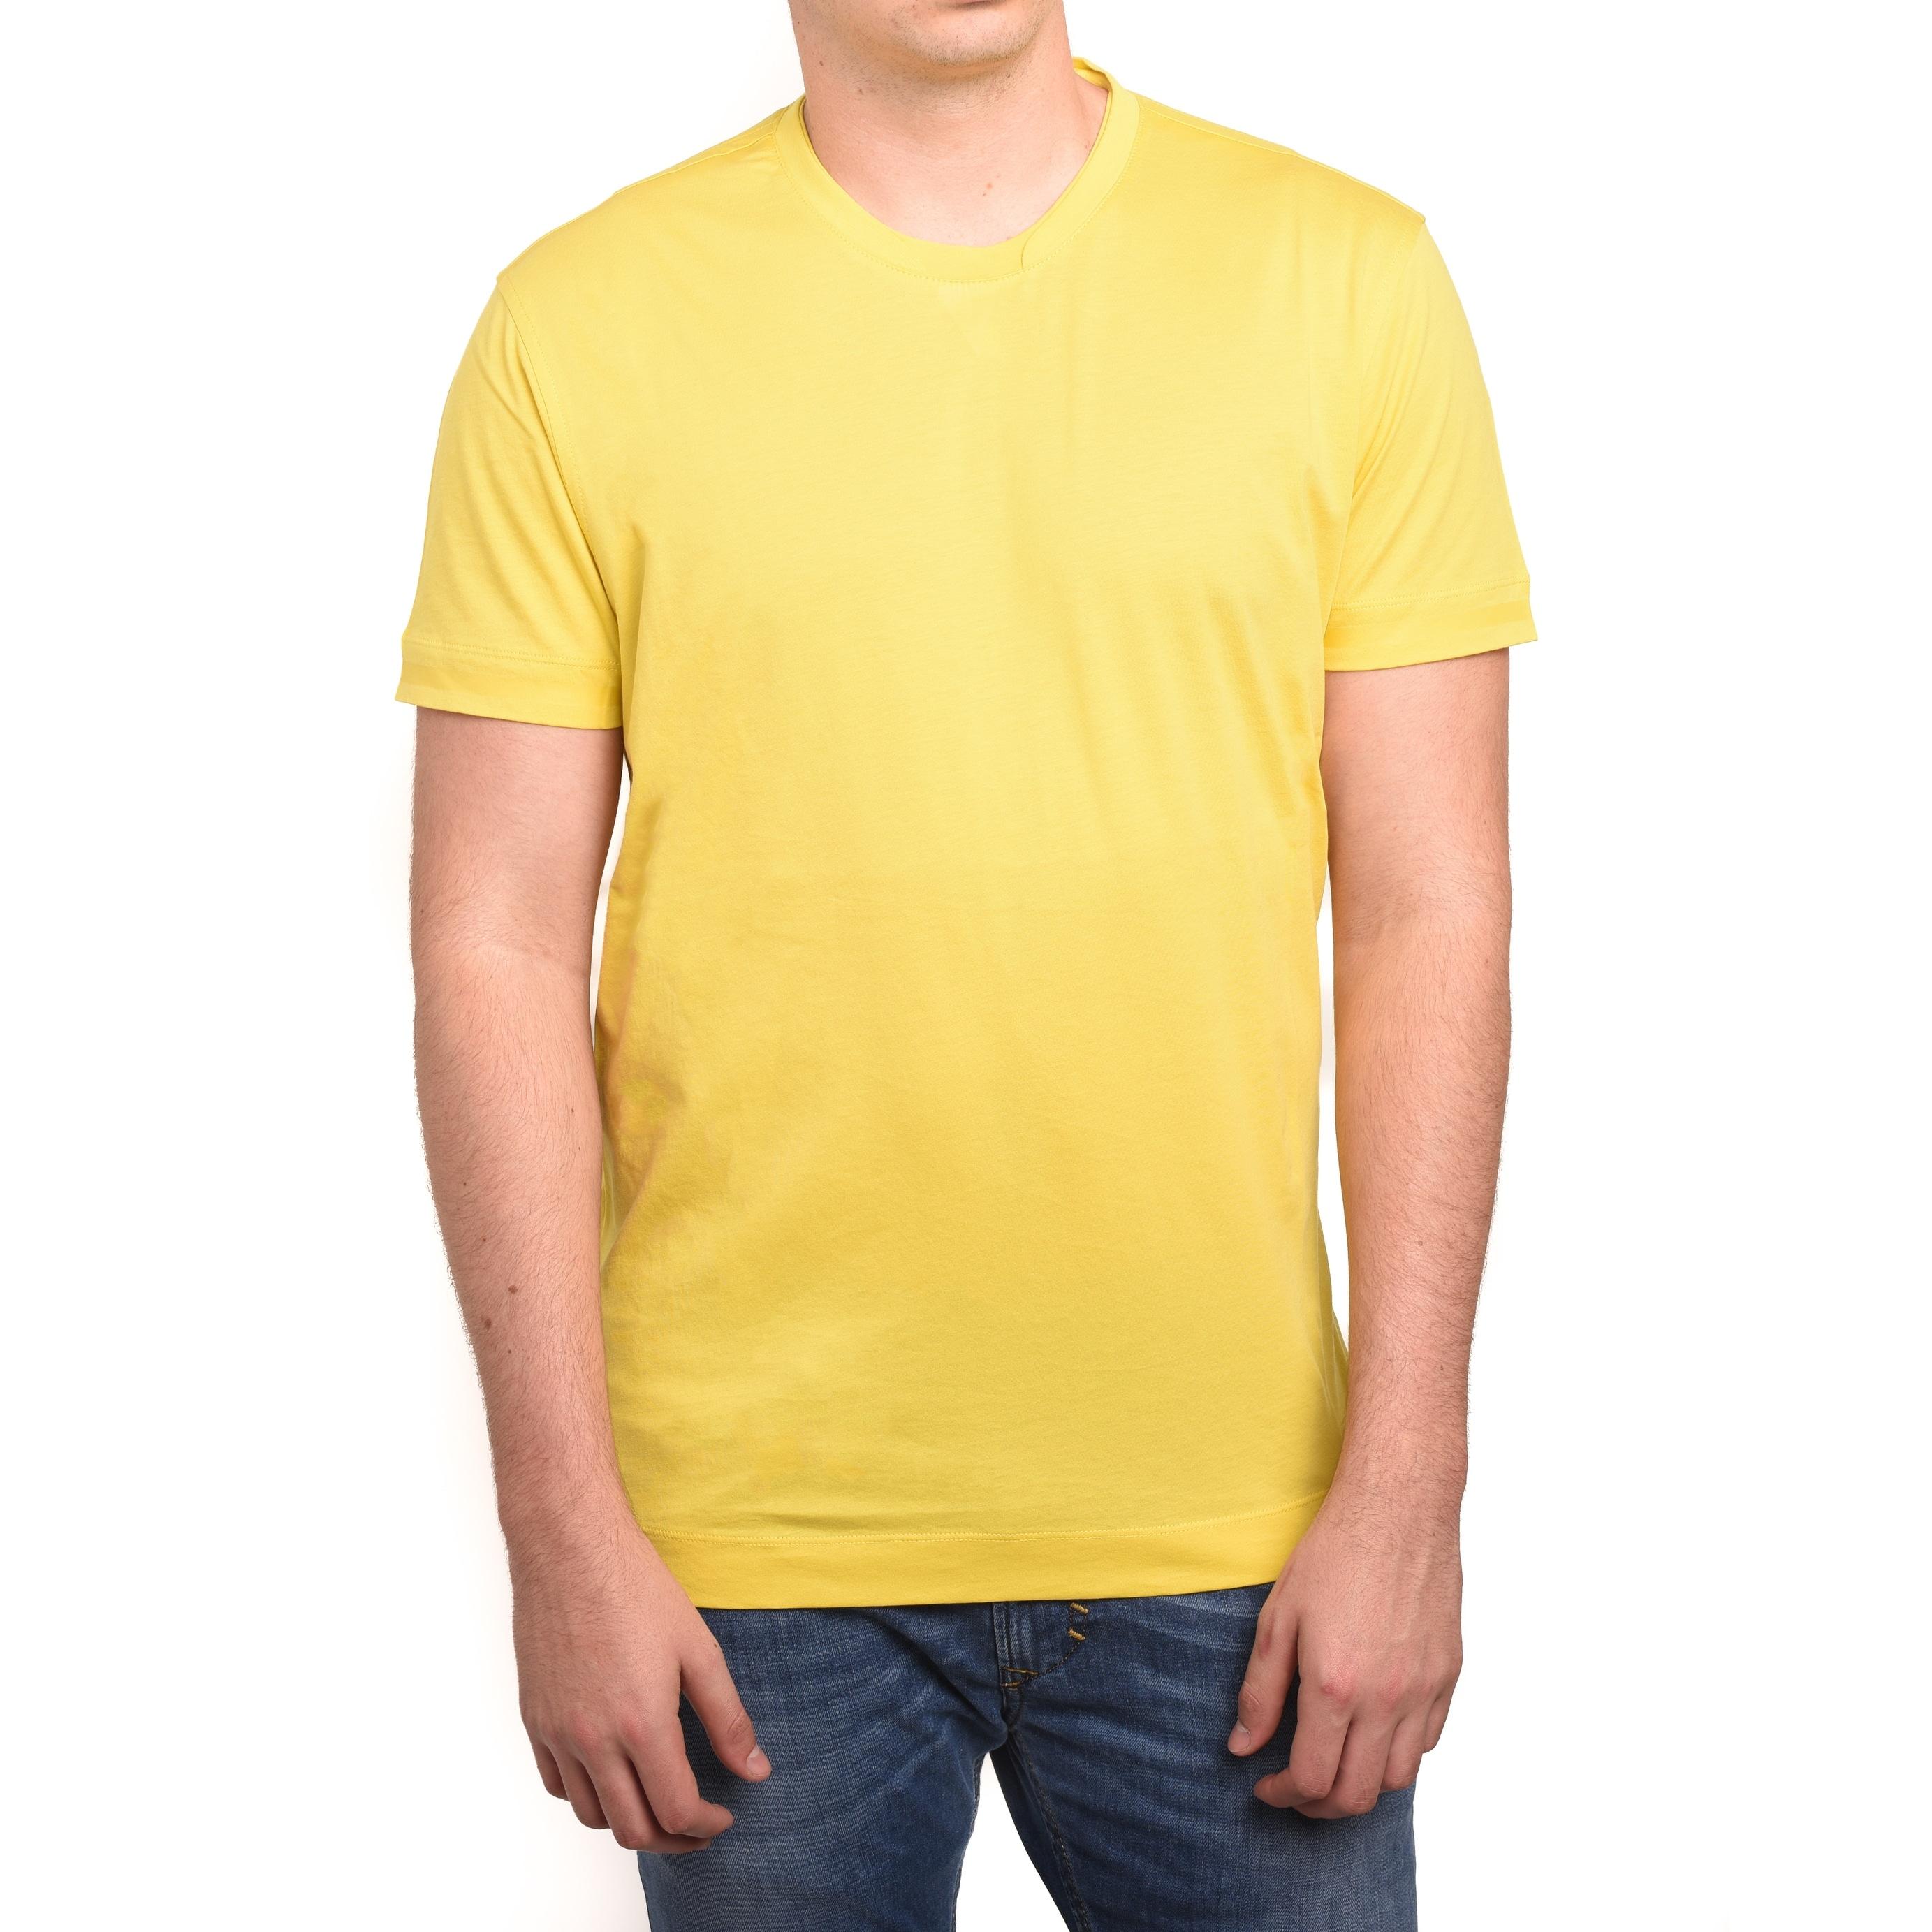 d0f4e4eaf3 Z Zegna by Ermenegildo Zegna Men Double Collar T-Shirt Yellow